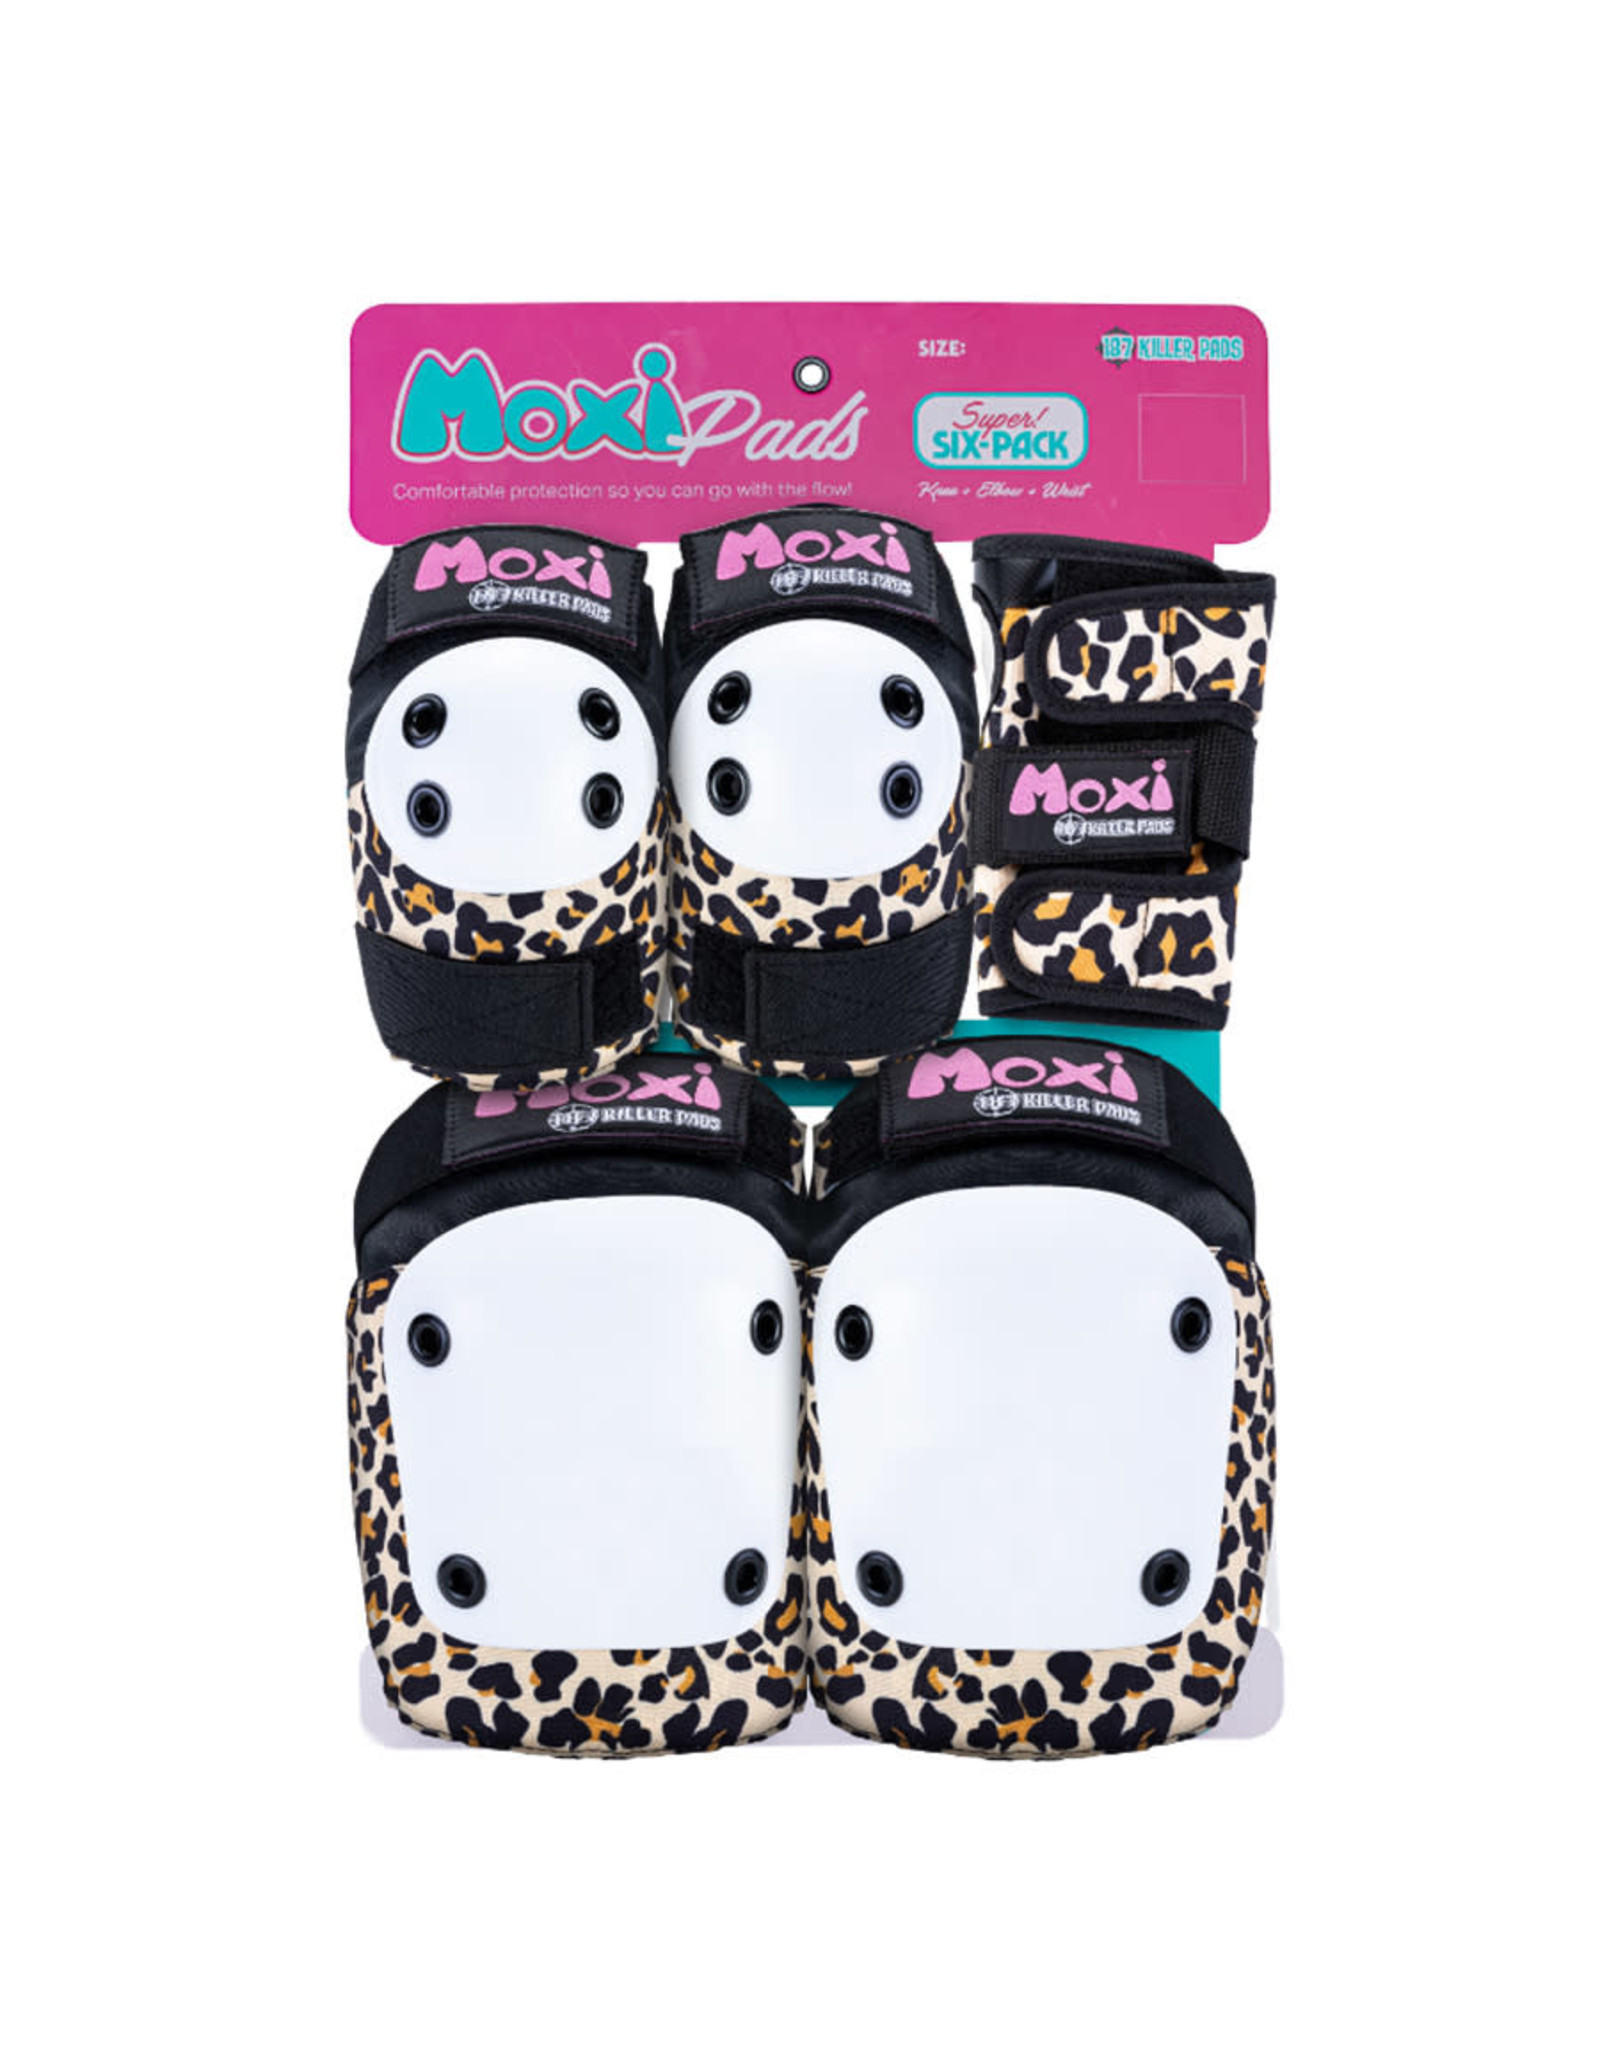 187 Killer Pads 187 Killer Pads Junior (Moxi Leopard)